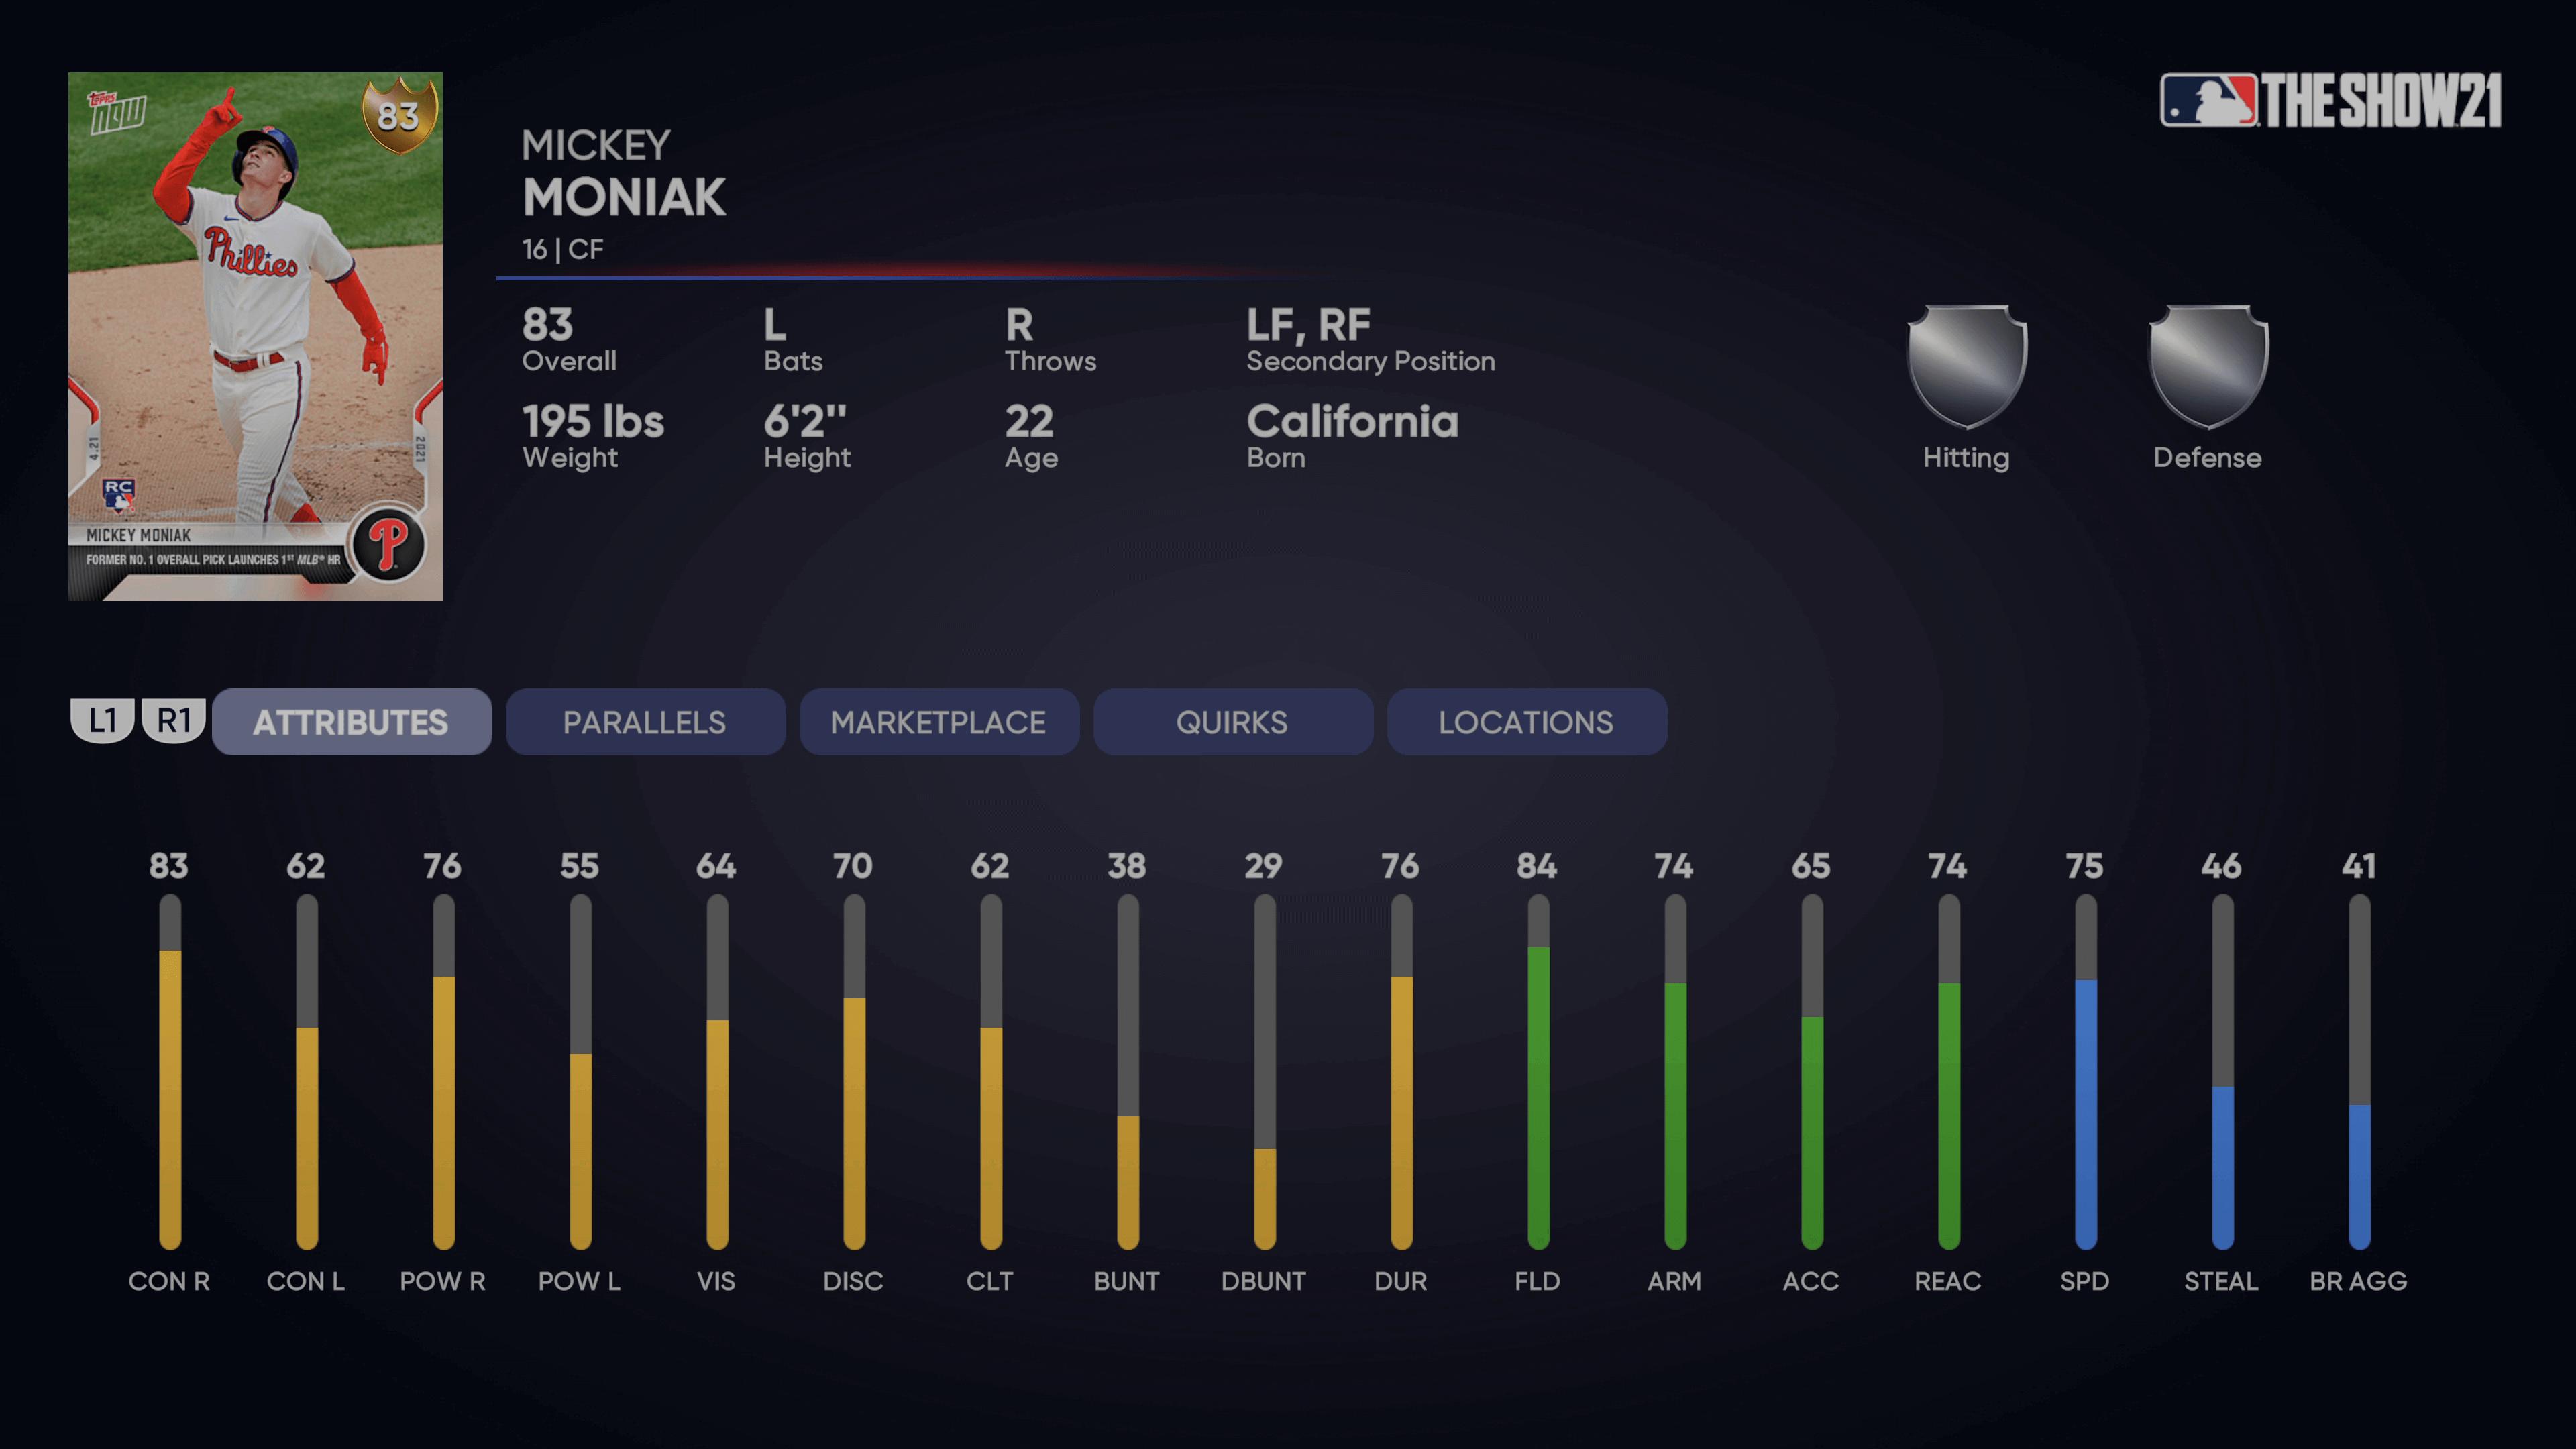 MLB The Show 21 - Topps Now Moniak